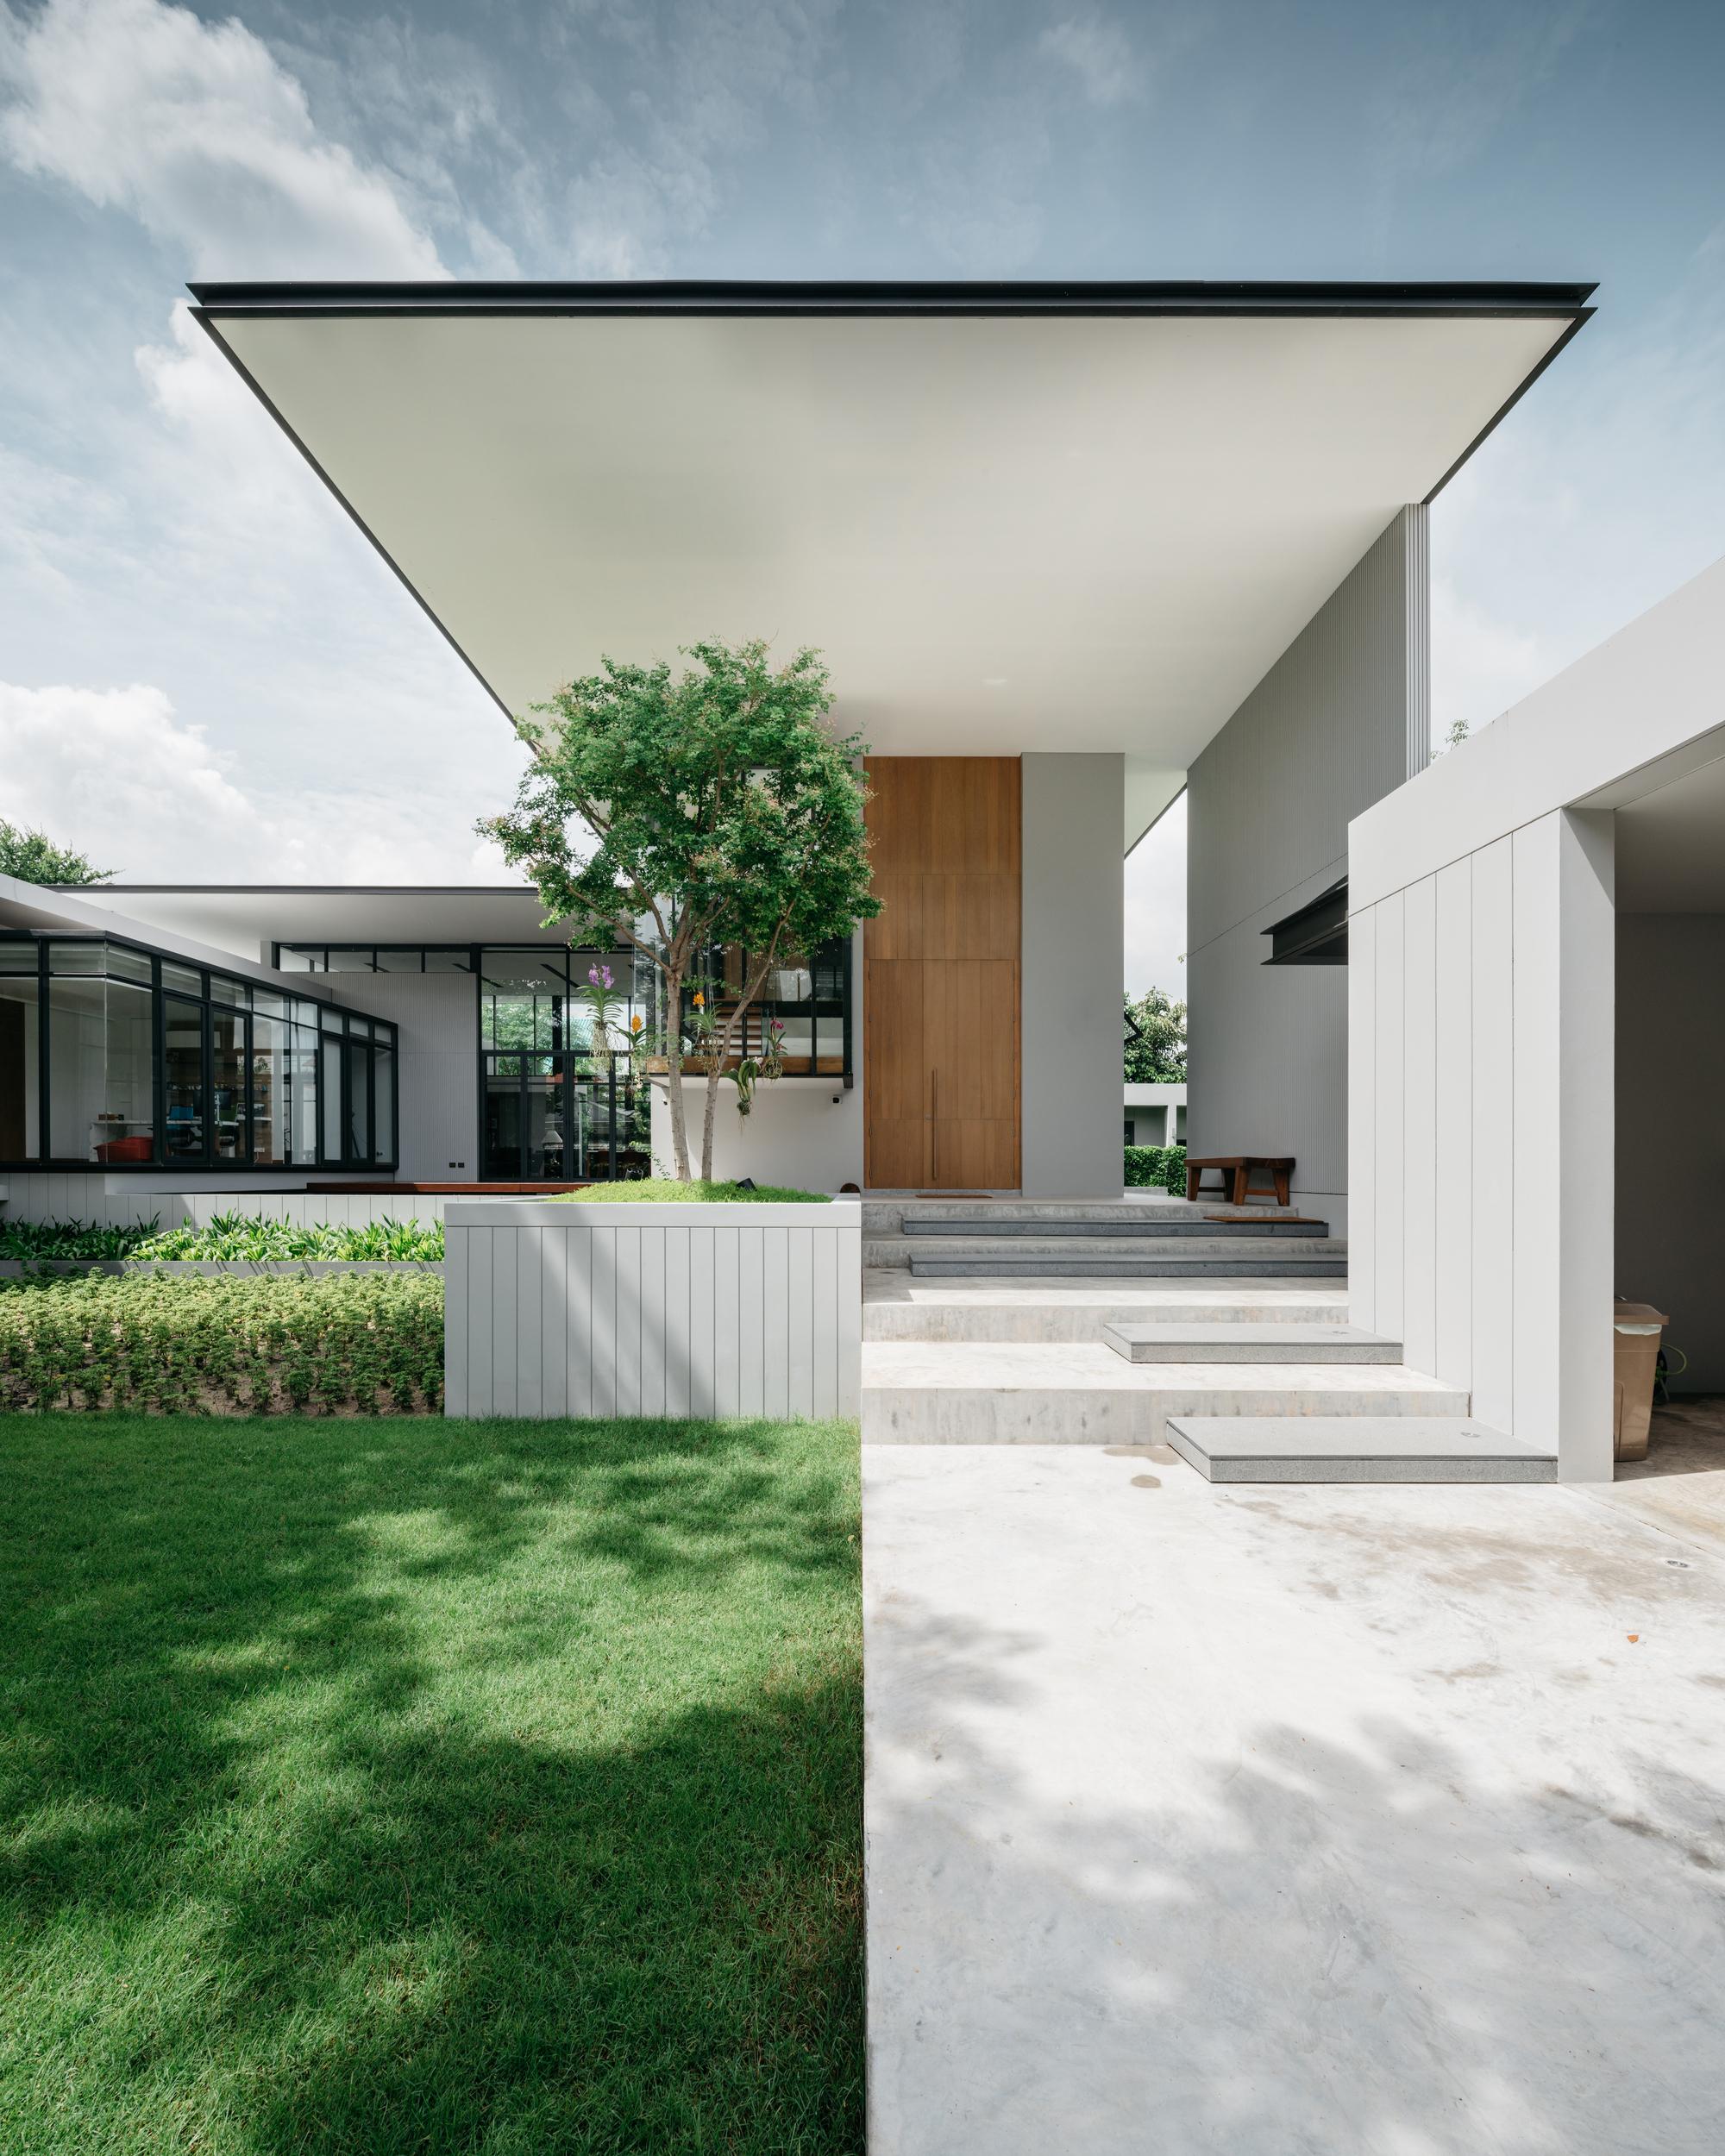 Chicago Modern Architecture Design: Ratchada 18 Residence / AOMO